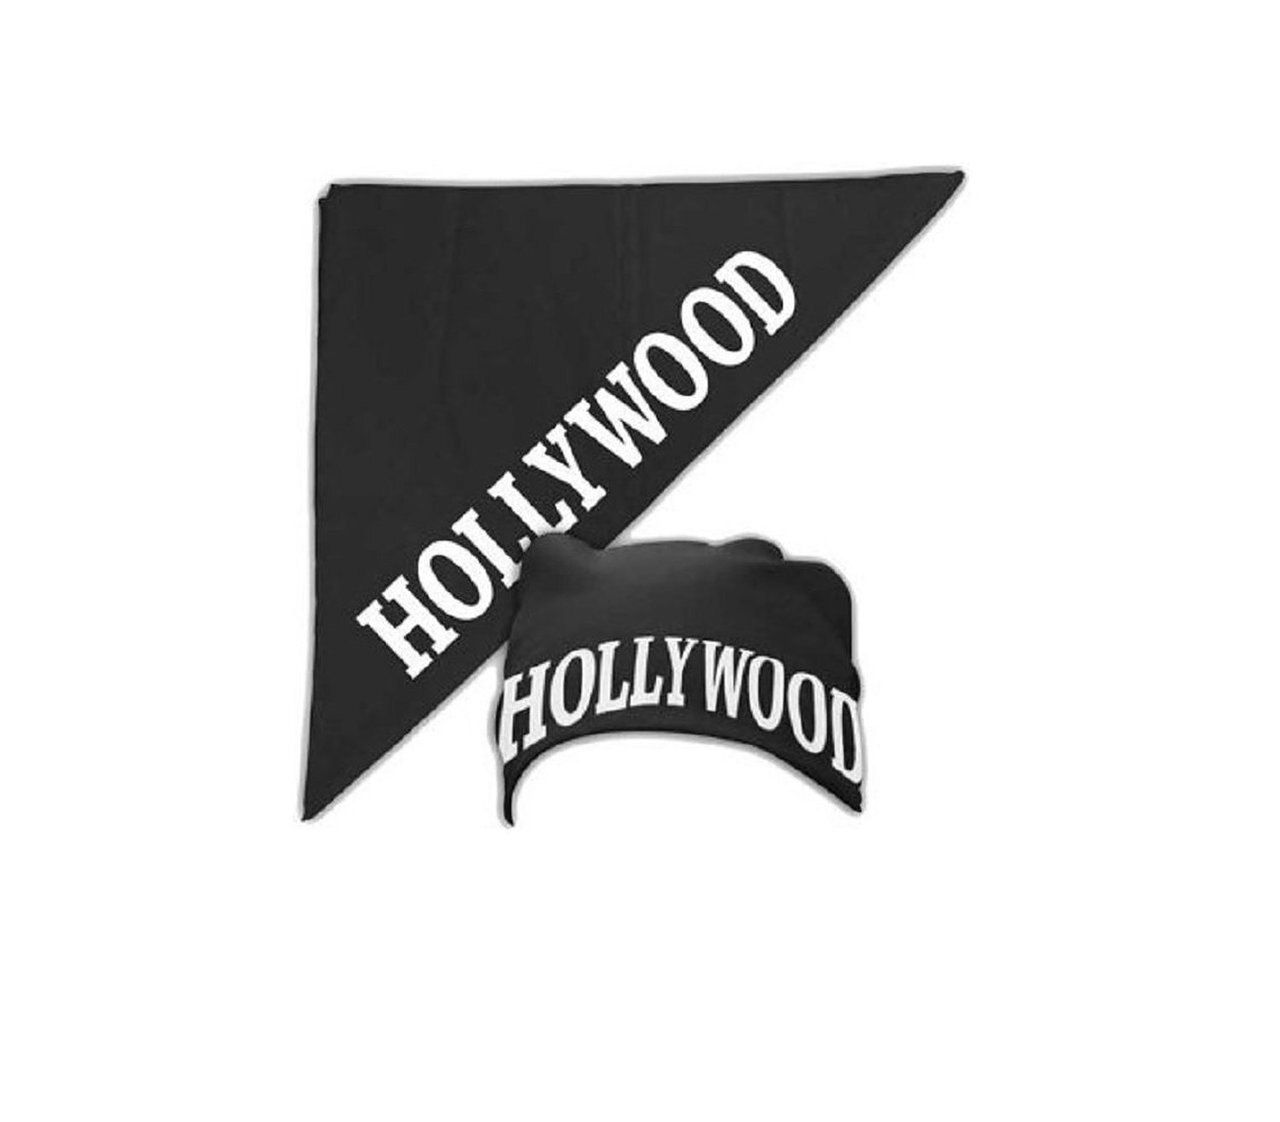 Officially Licensed Hulk Hogan Hollywood Bandana